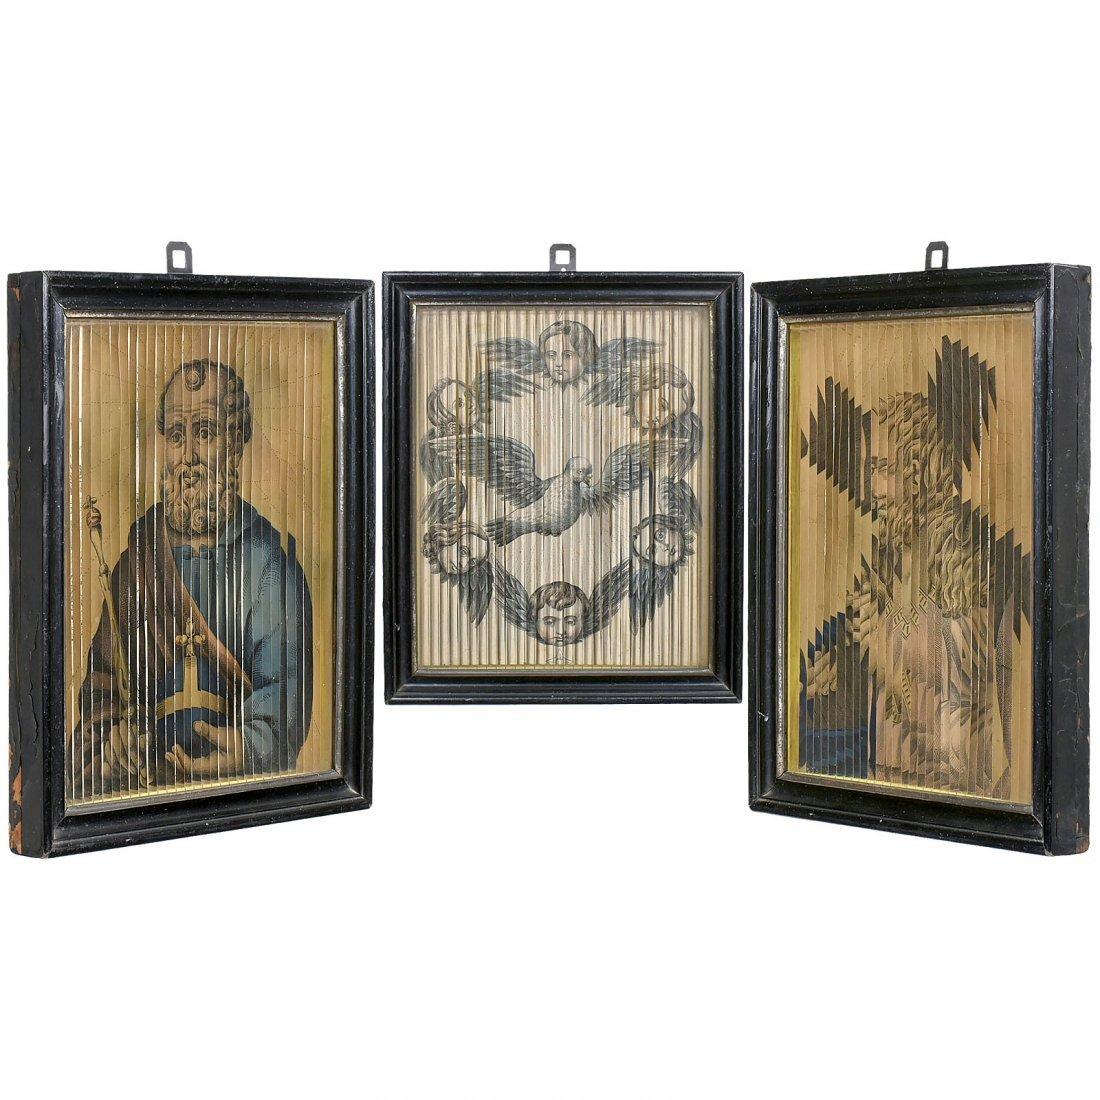 3 Tabula Stritta Pictures (Triscenorama = Three-Way - 3